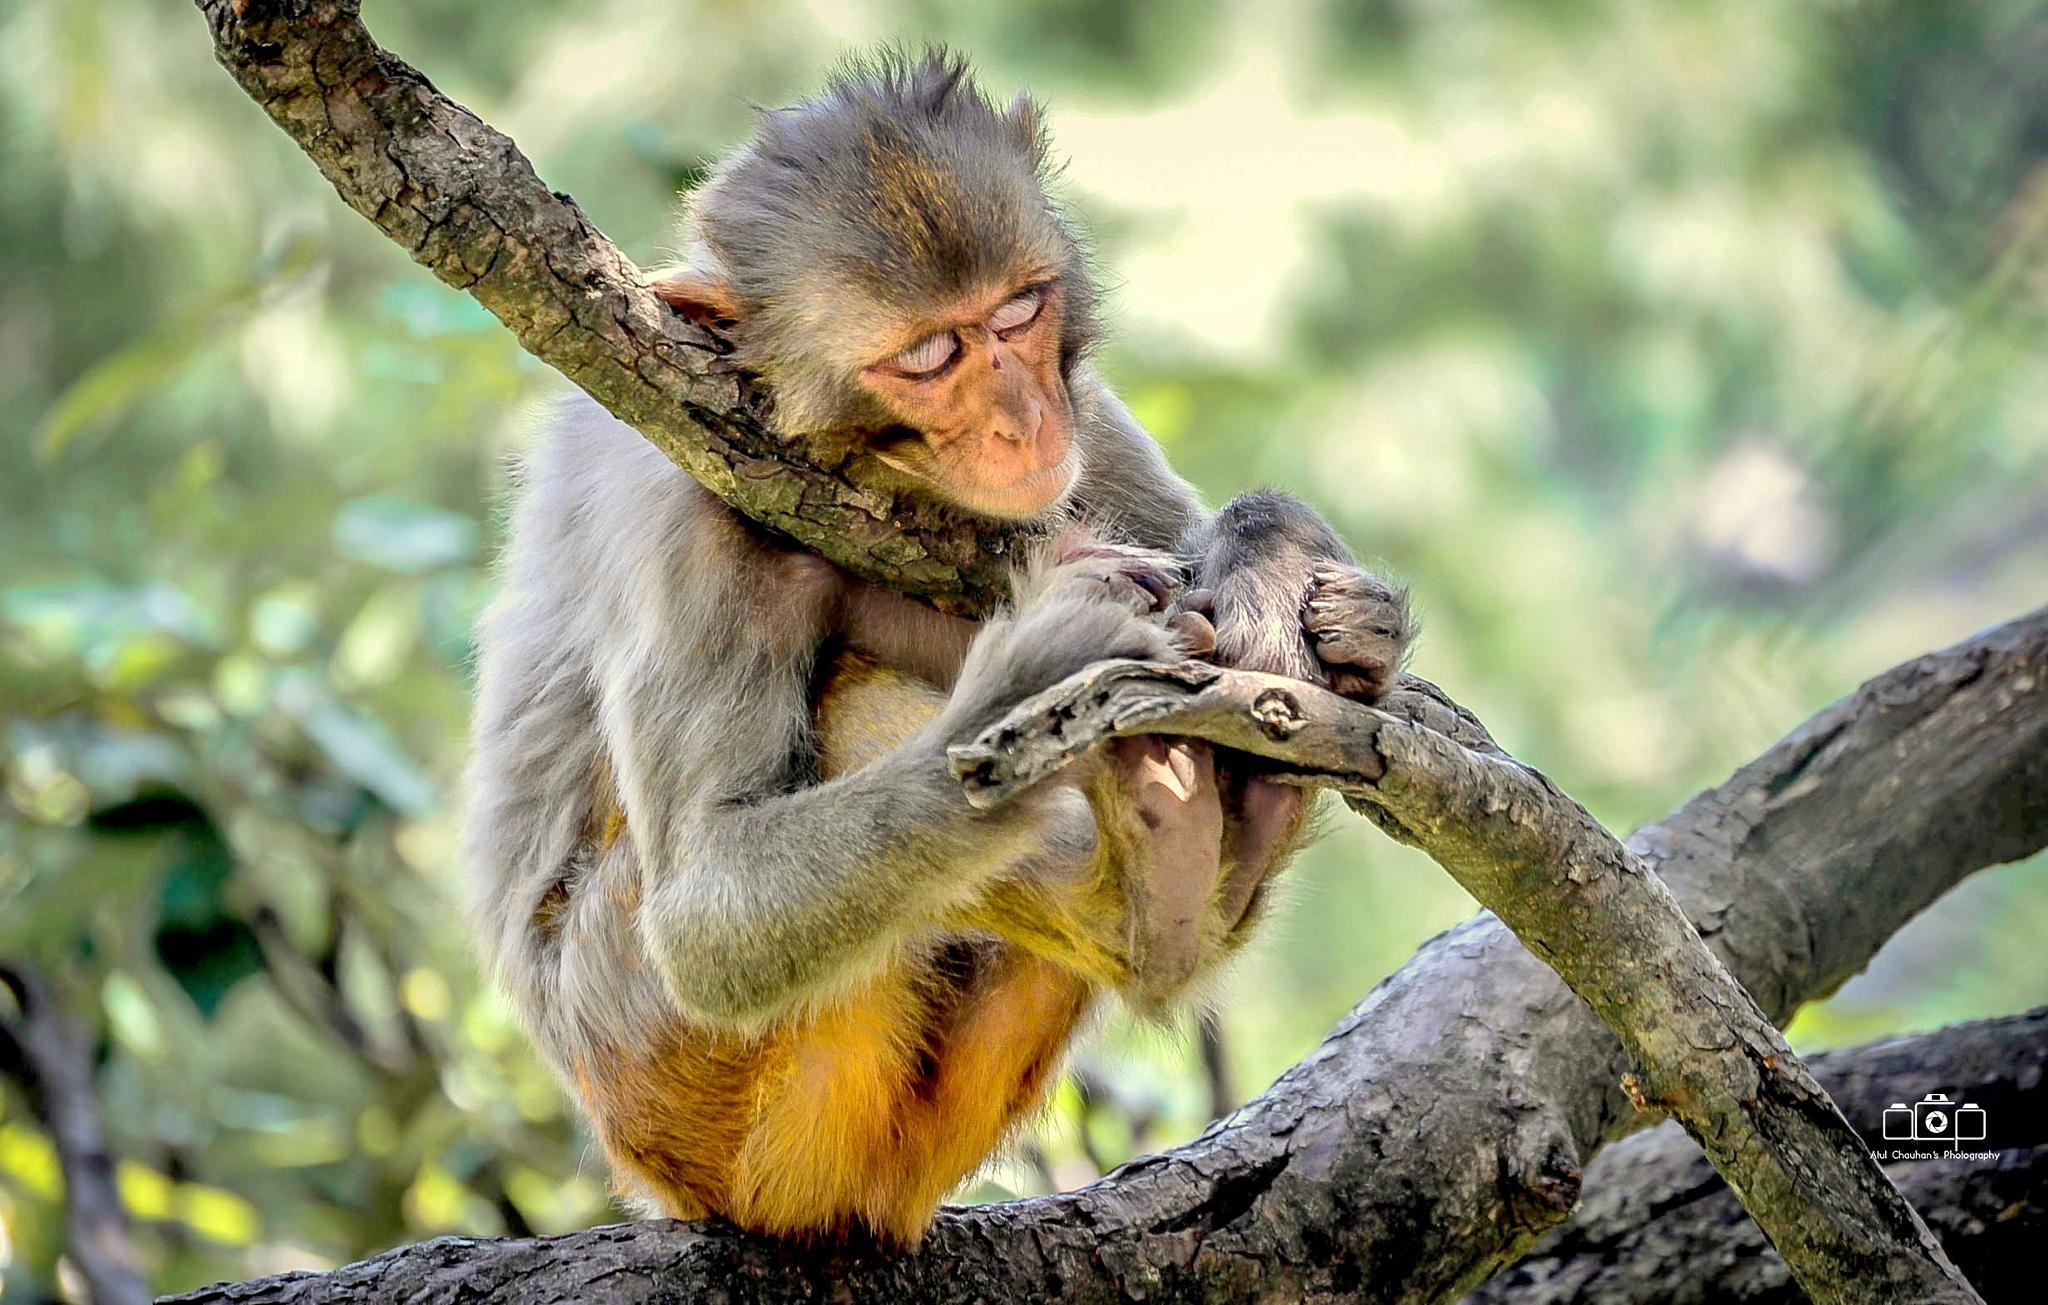 Sleeping Monkey  by Atul Chauhan